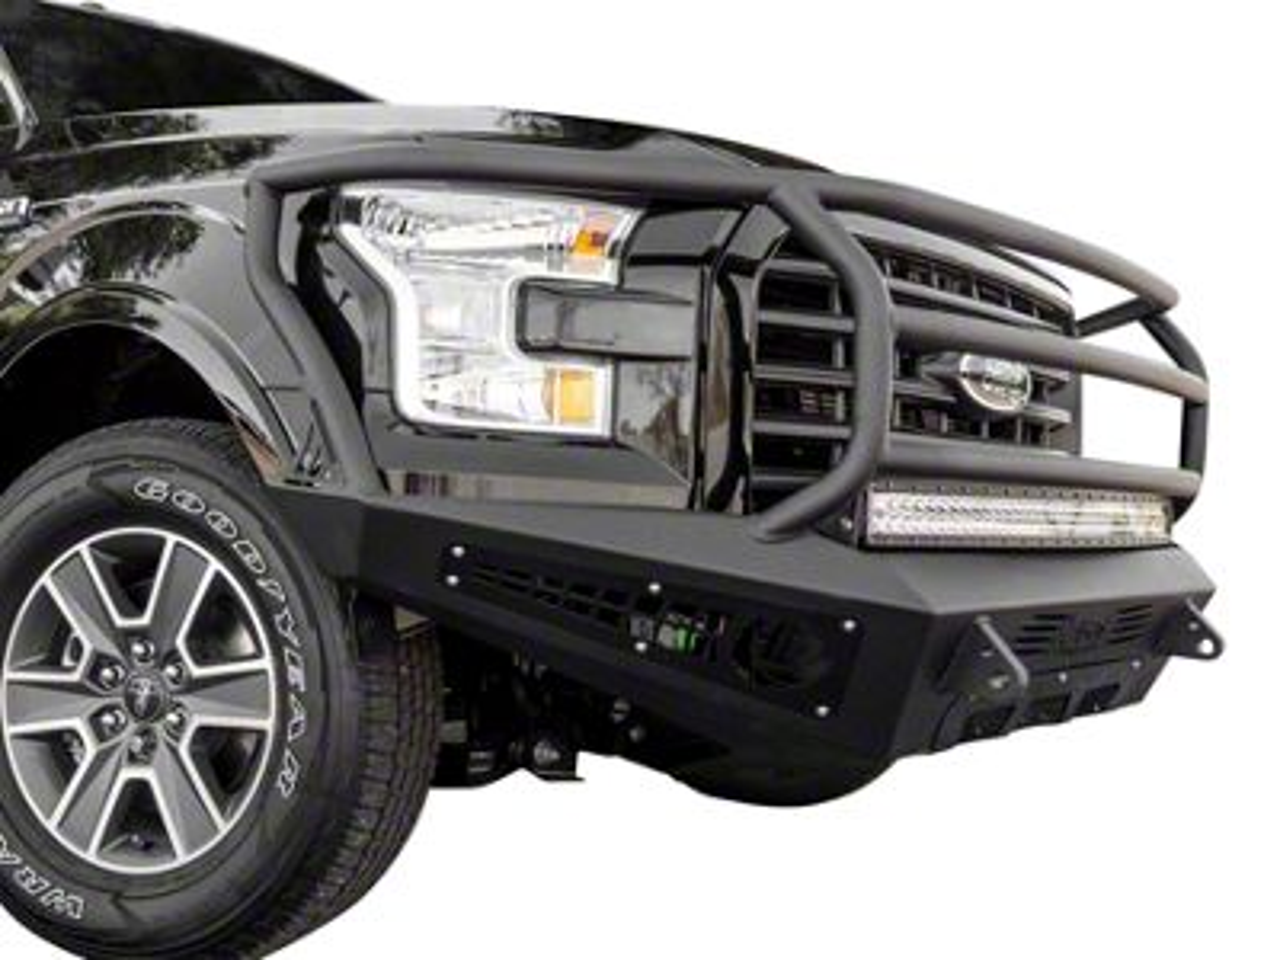 Addictive Desert Designs HoneyBadger Rancher Front Bumper w/ Intercooler Vents (15-17 F-150, Excluding Raptor)